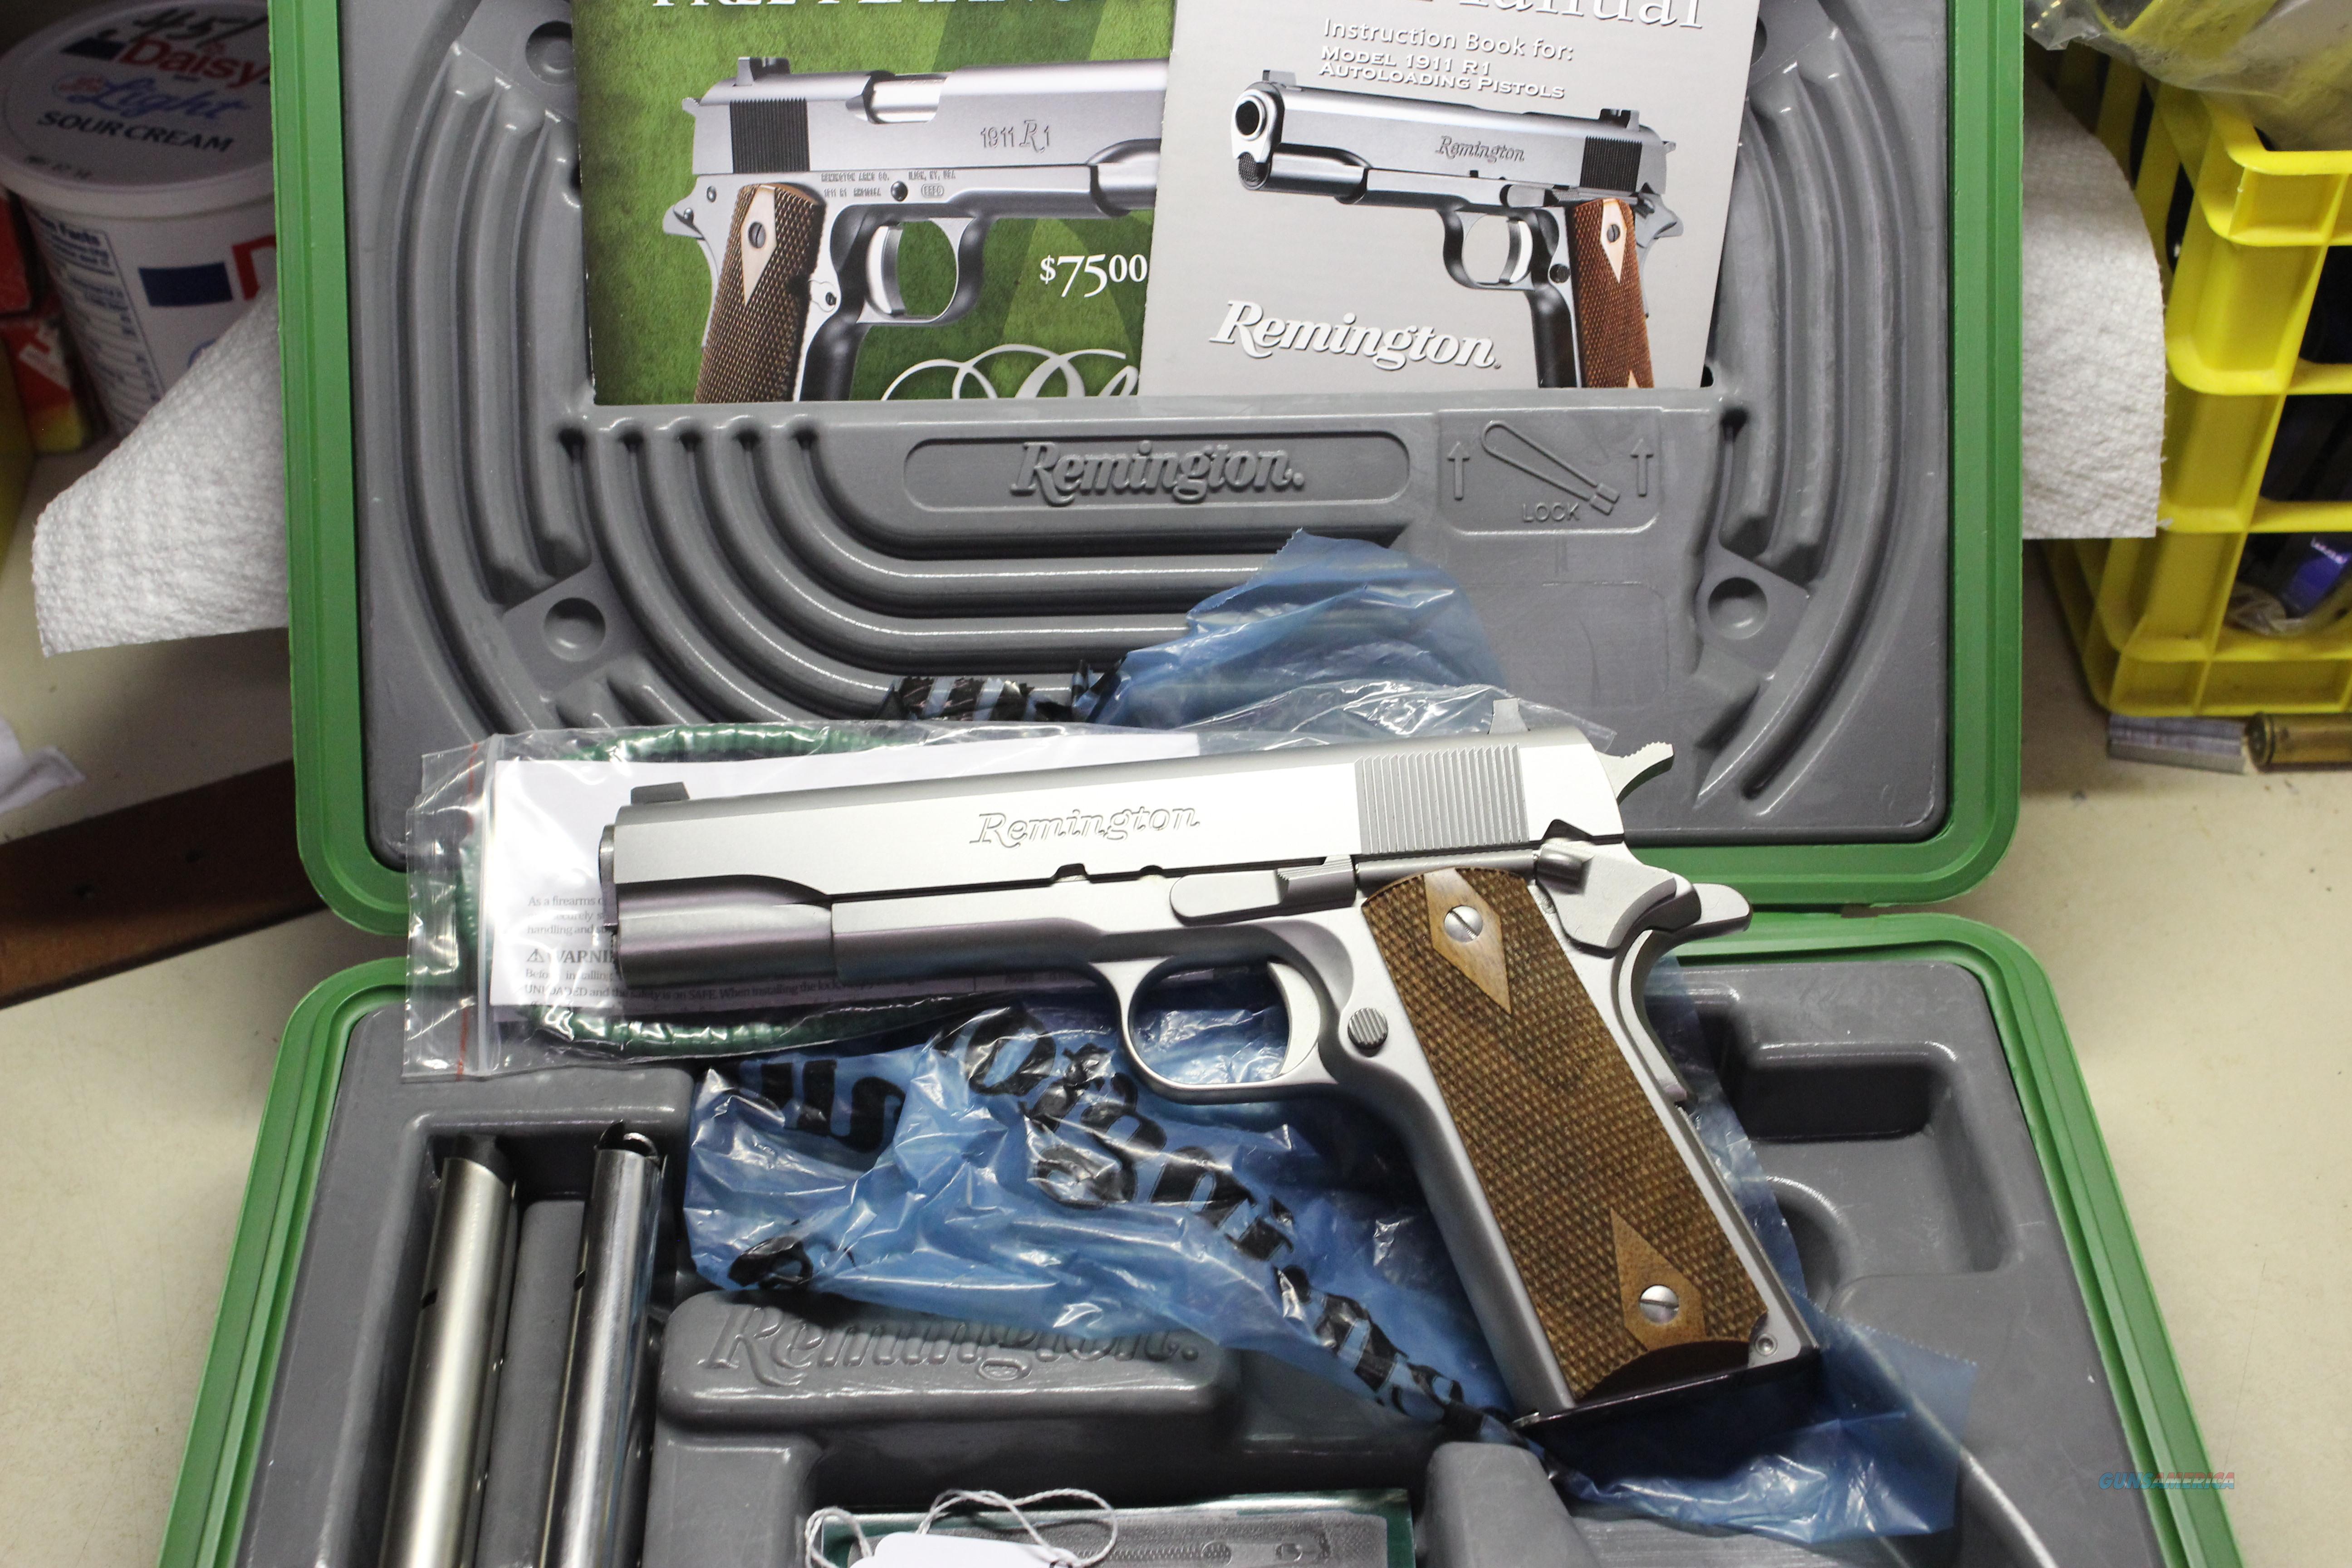 REMINGTON 1911 R1S  Guns > Pistols > Remington Pistols - Modern > 1911